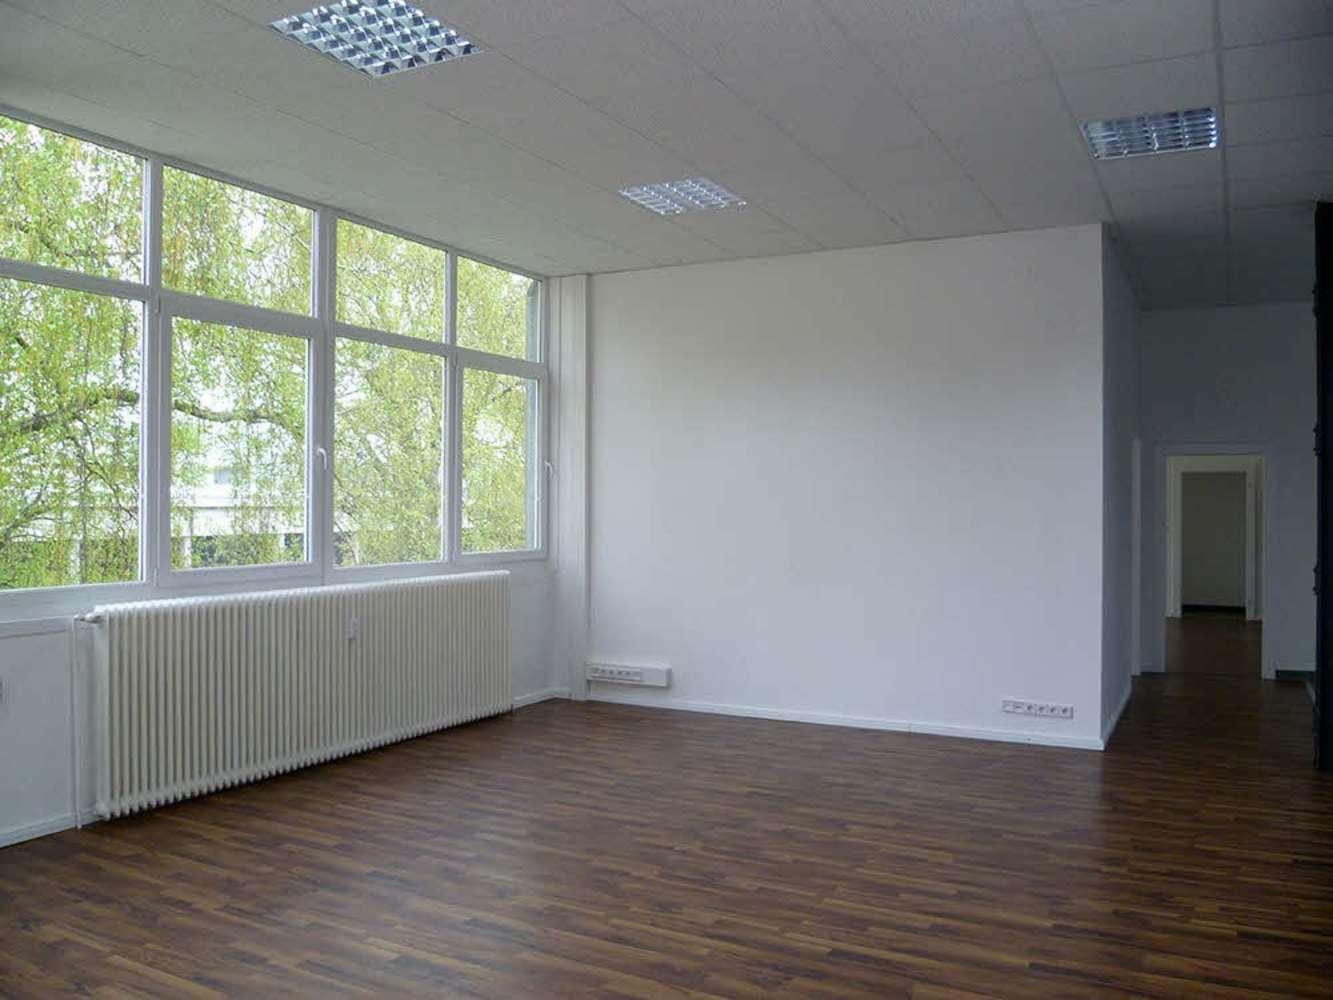 Büros Berlin, 13407 - Büro - Berlin, Reinickendorf - B1600 - 9915098